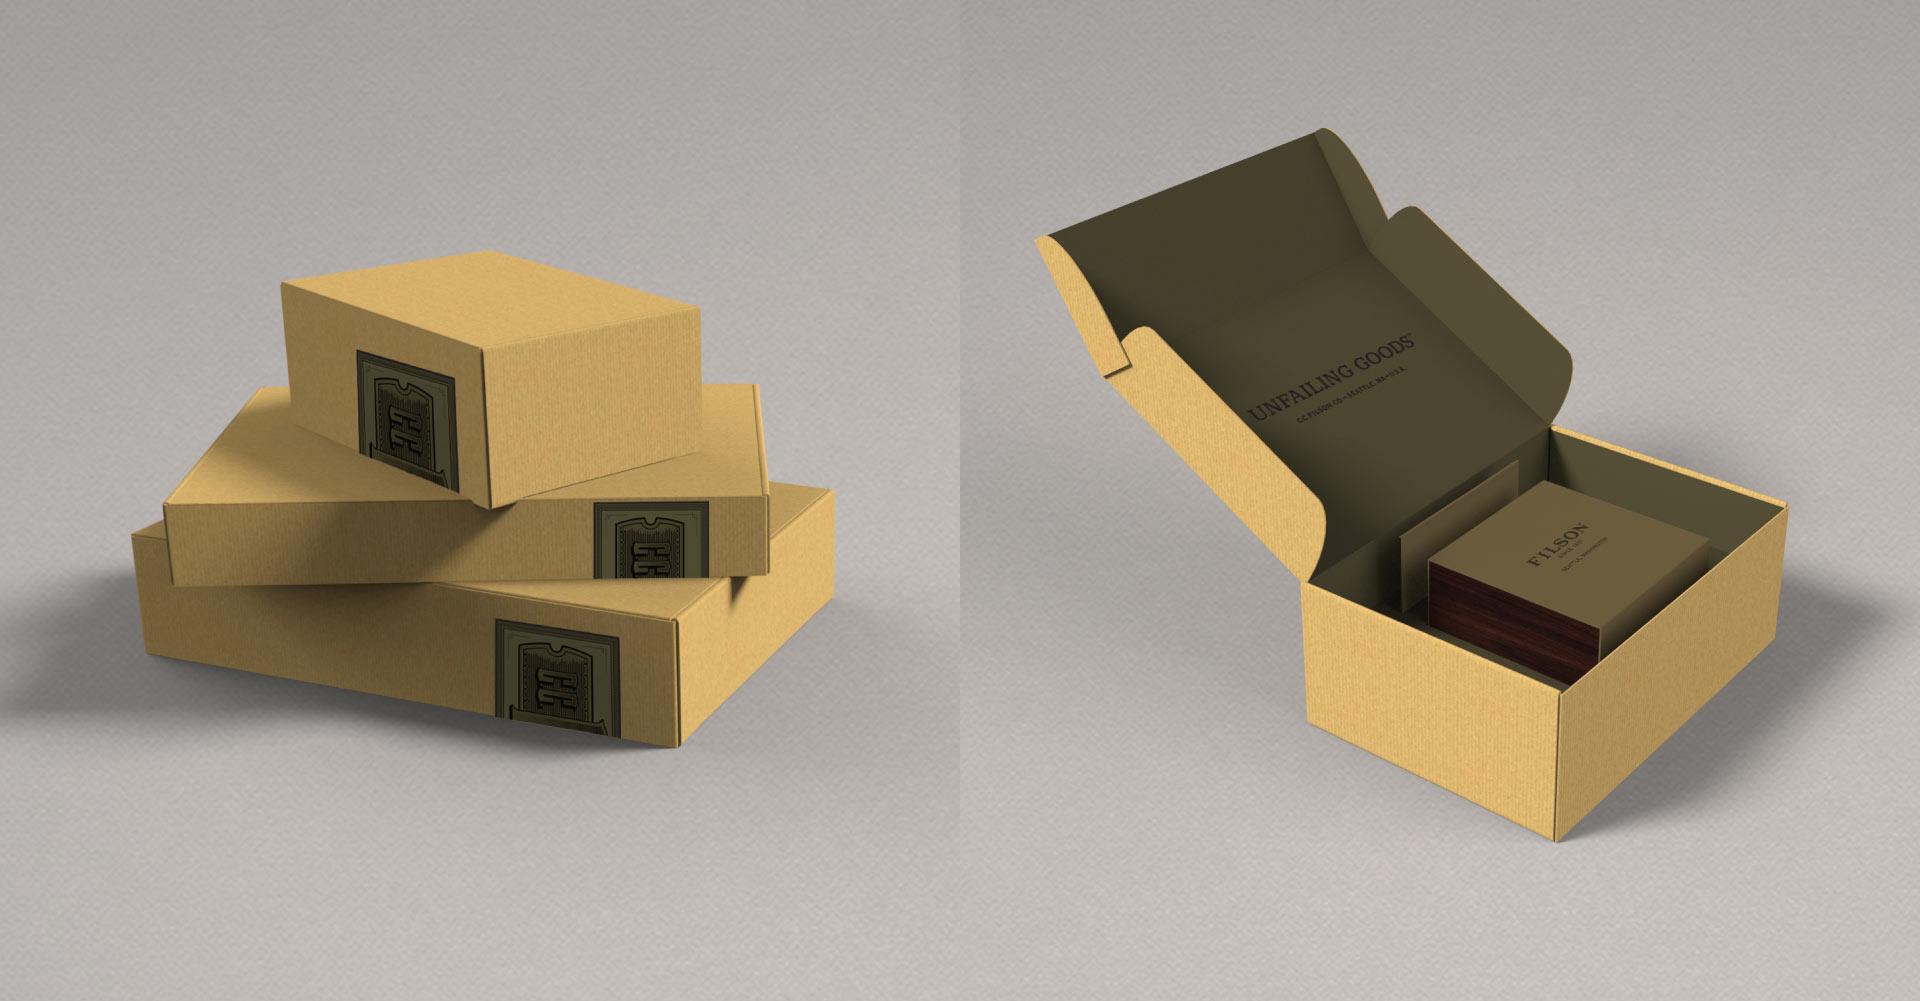 Creative_Retail_Packaging_Custom_Packaging_Structural_Design_Filson_05.jpg